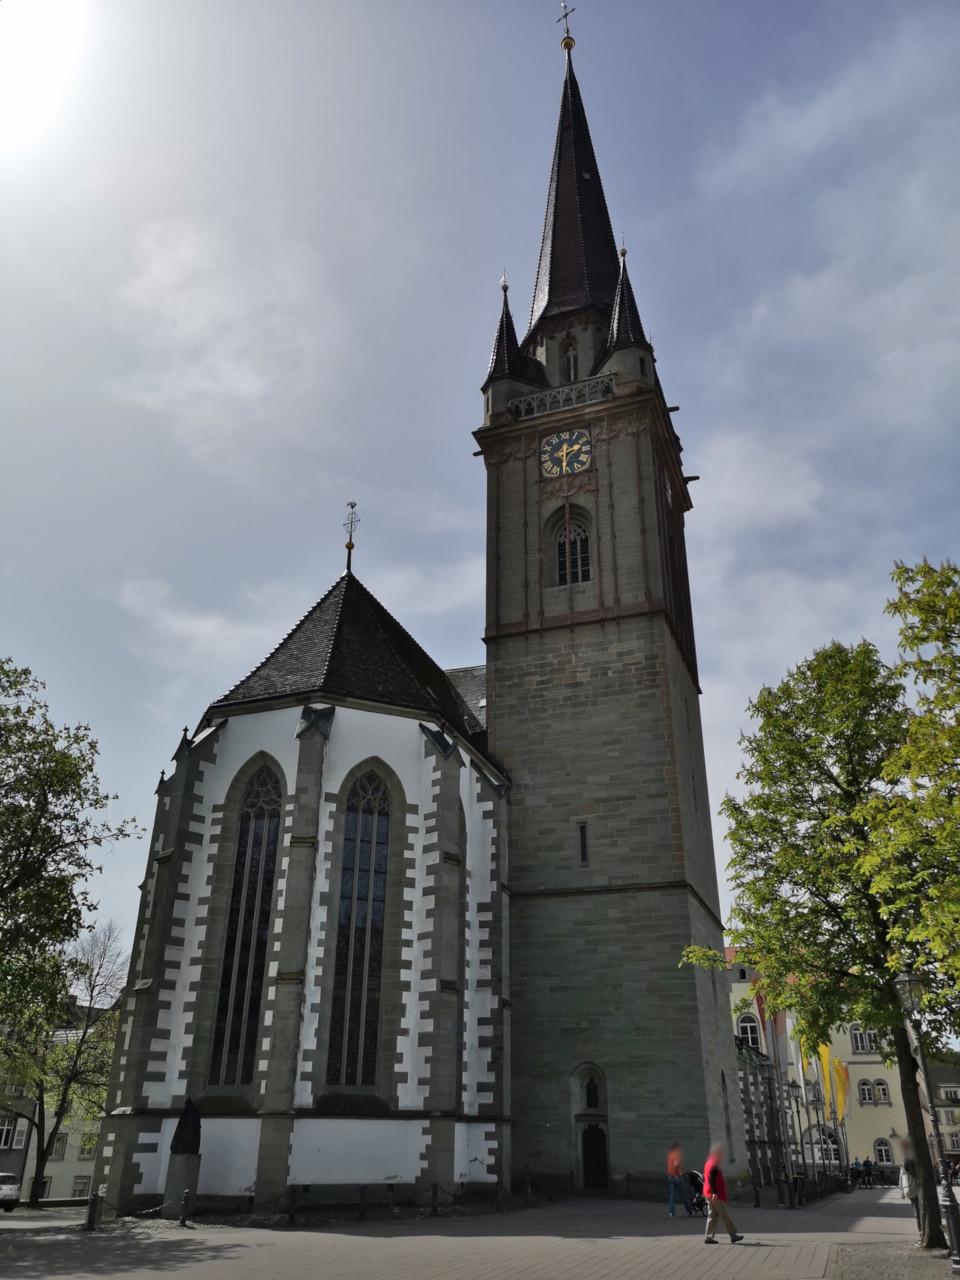 20190422_Radolfzell_041